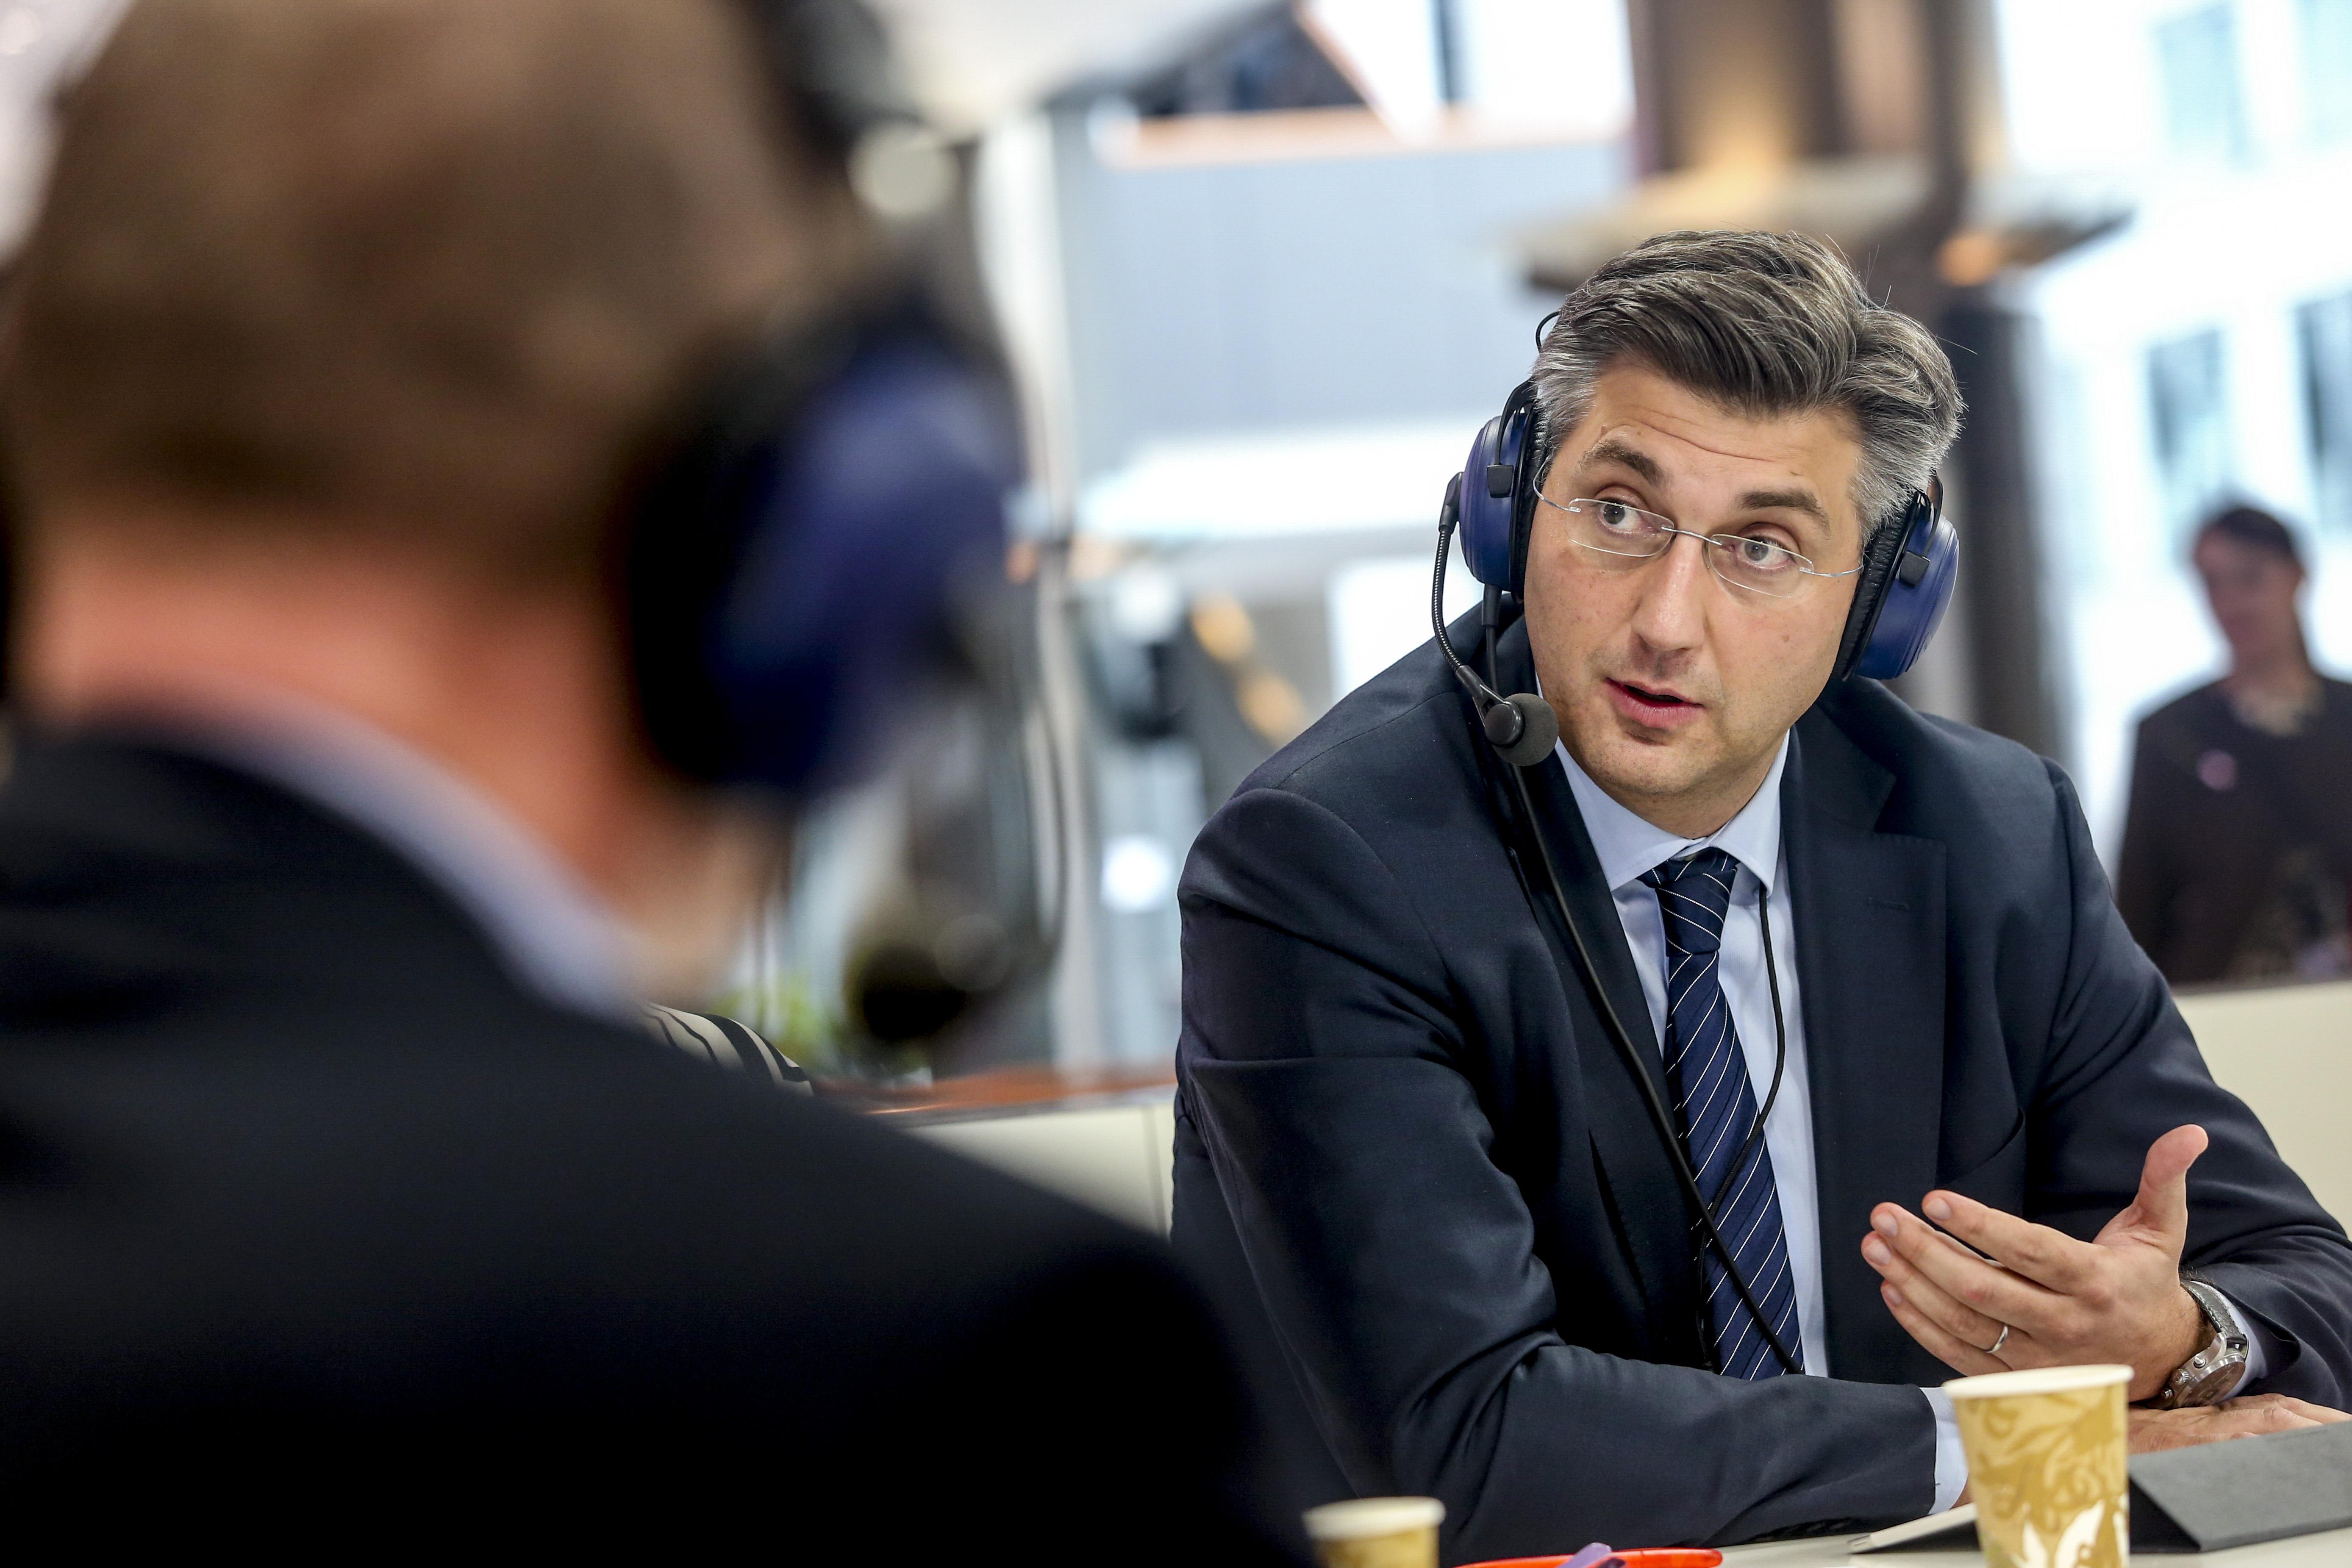 Andrej Plenković ai tempi del Parlamento europeo